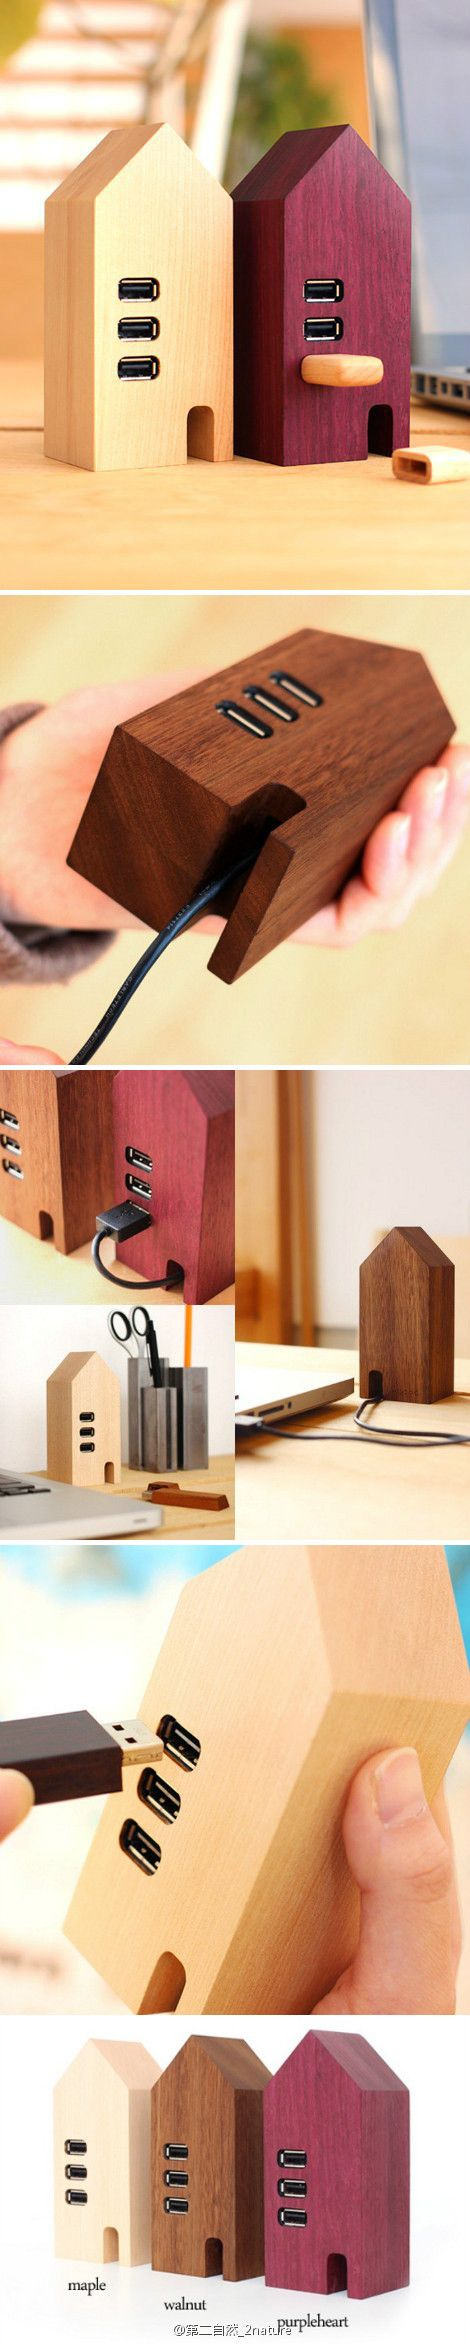 USB集线器来自Hacoa